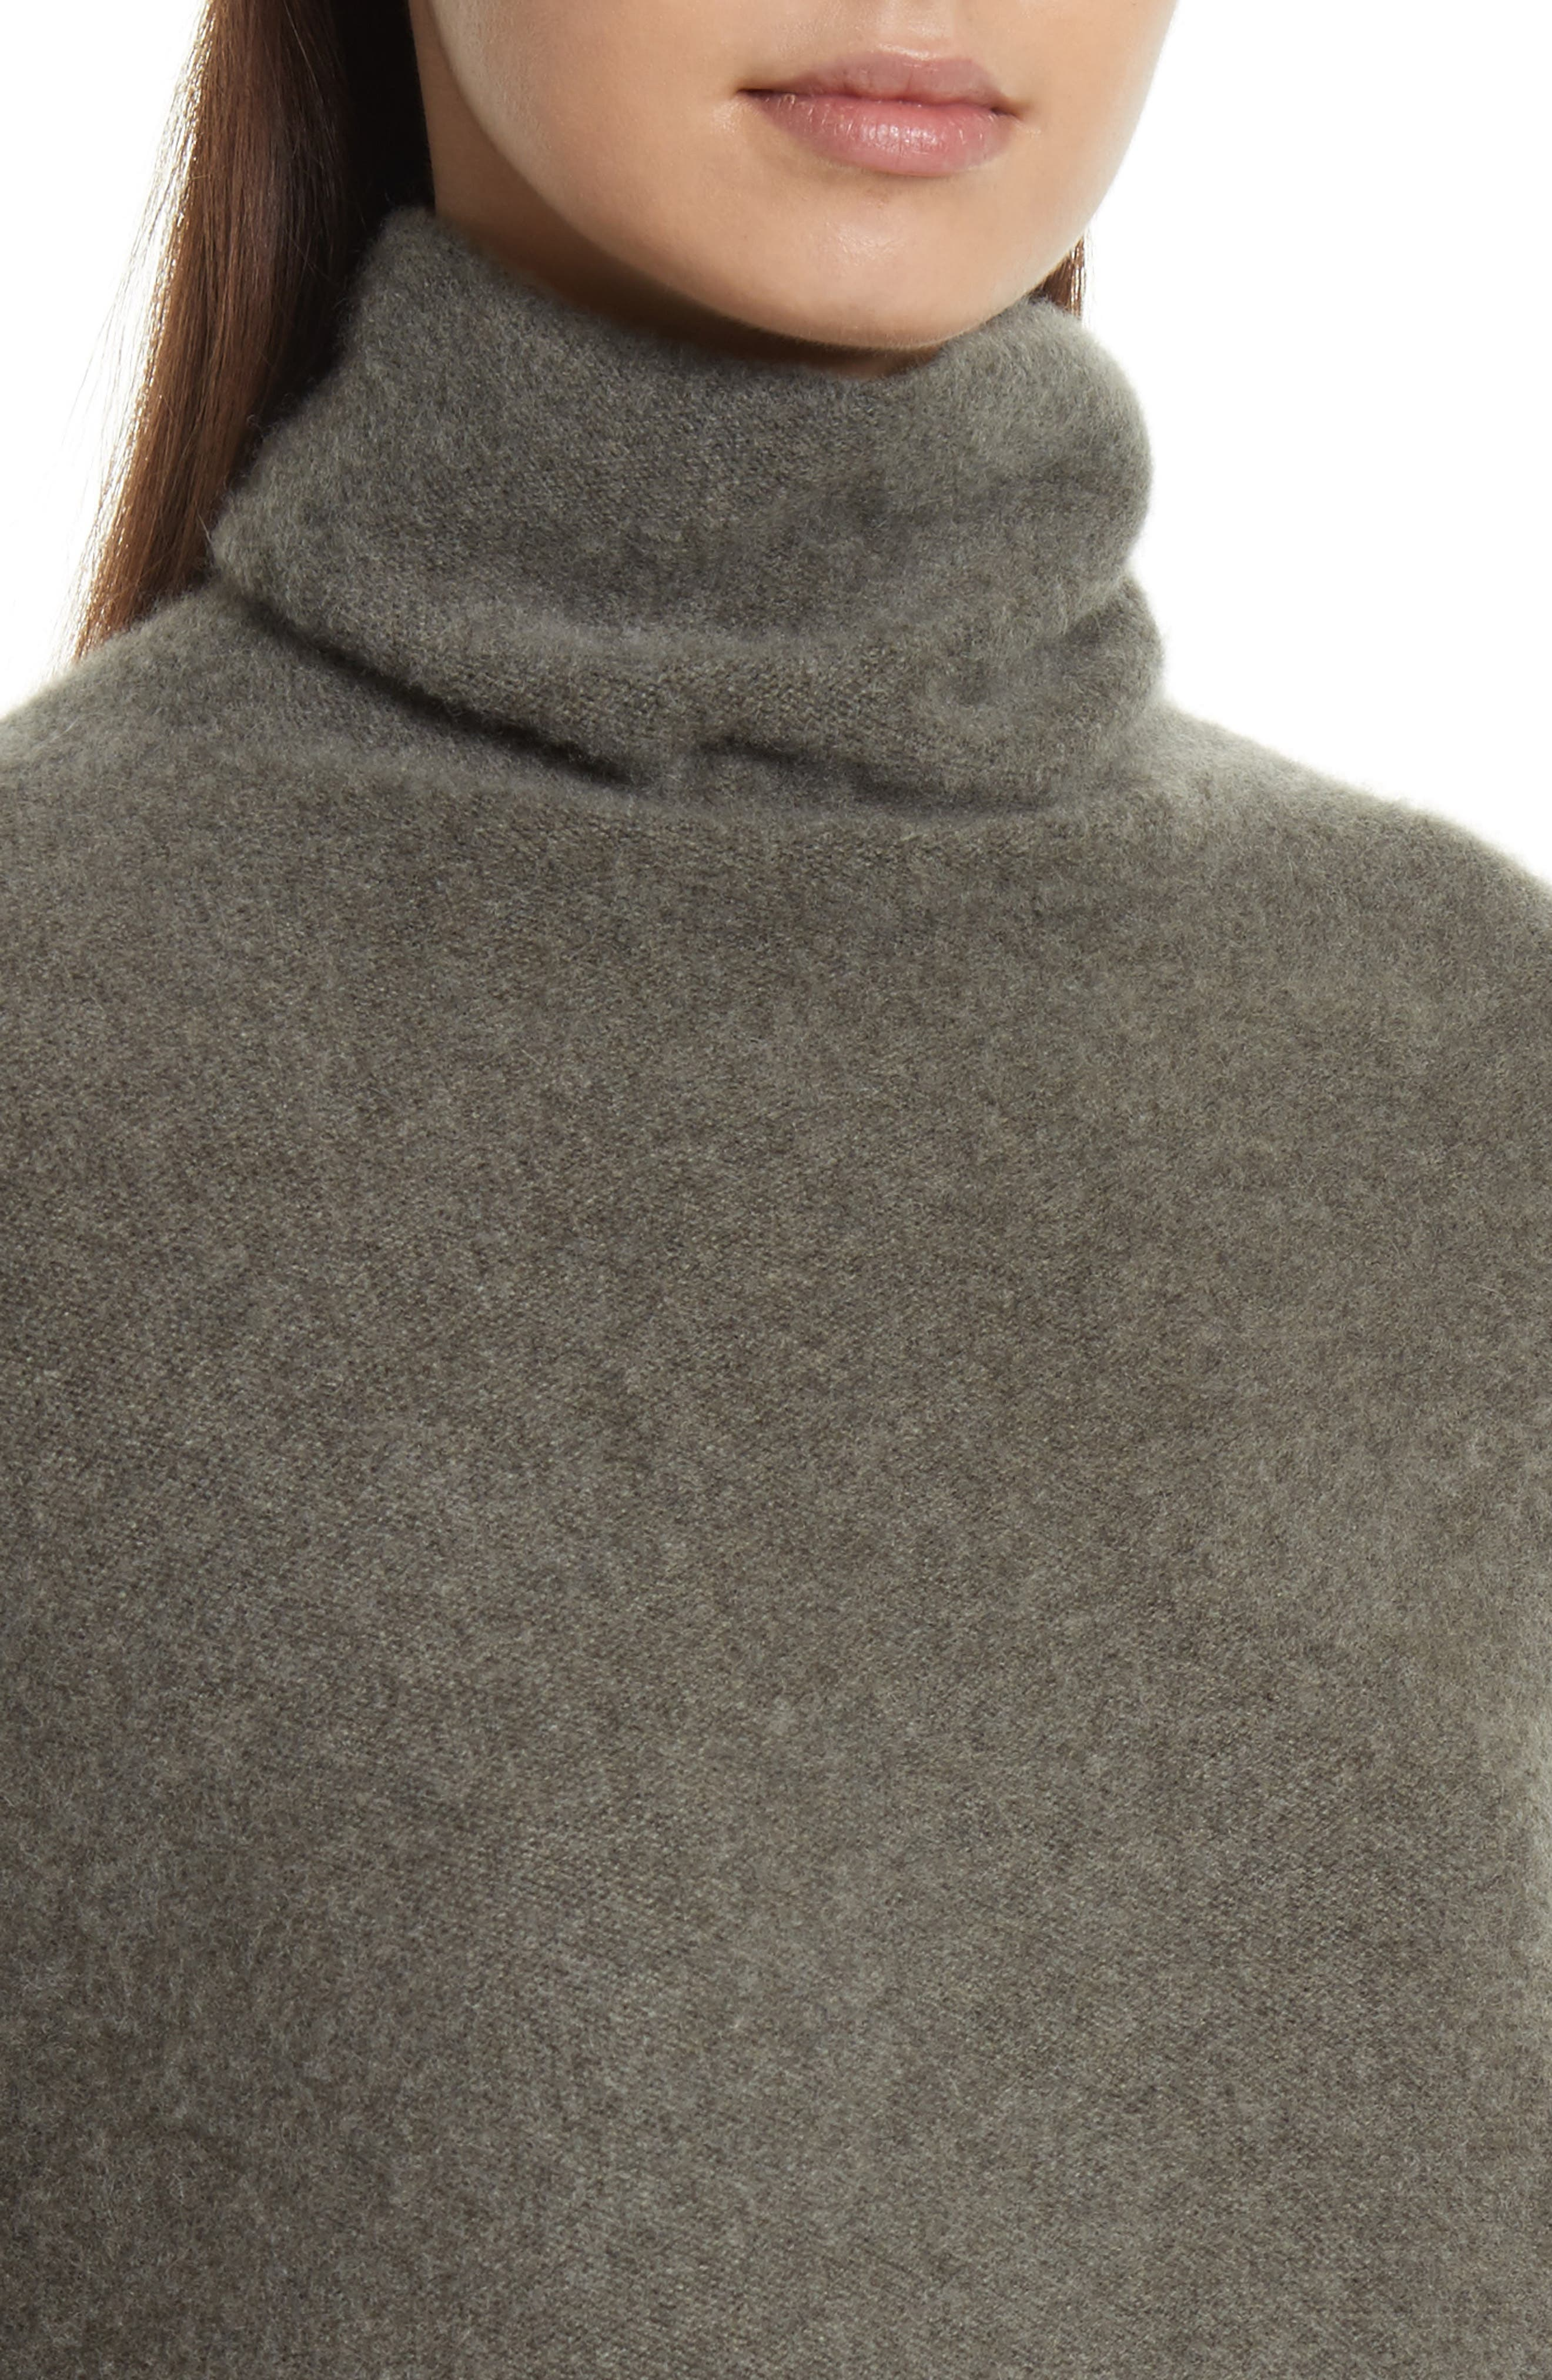 Boxy Mock Neck Cashmere Sweater,                             Alternate thumbnail 4, color,                             Desert Sage